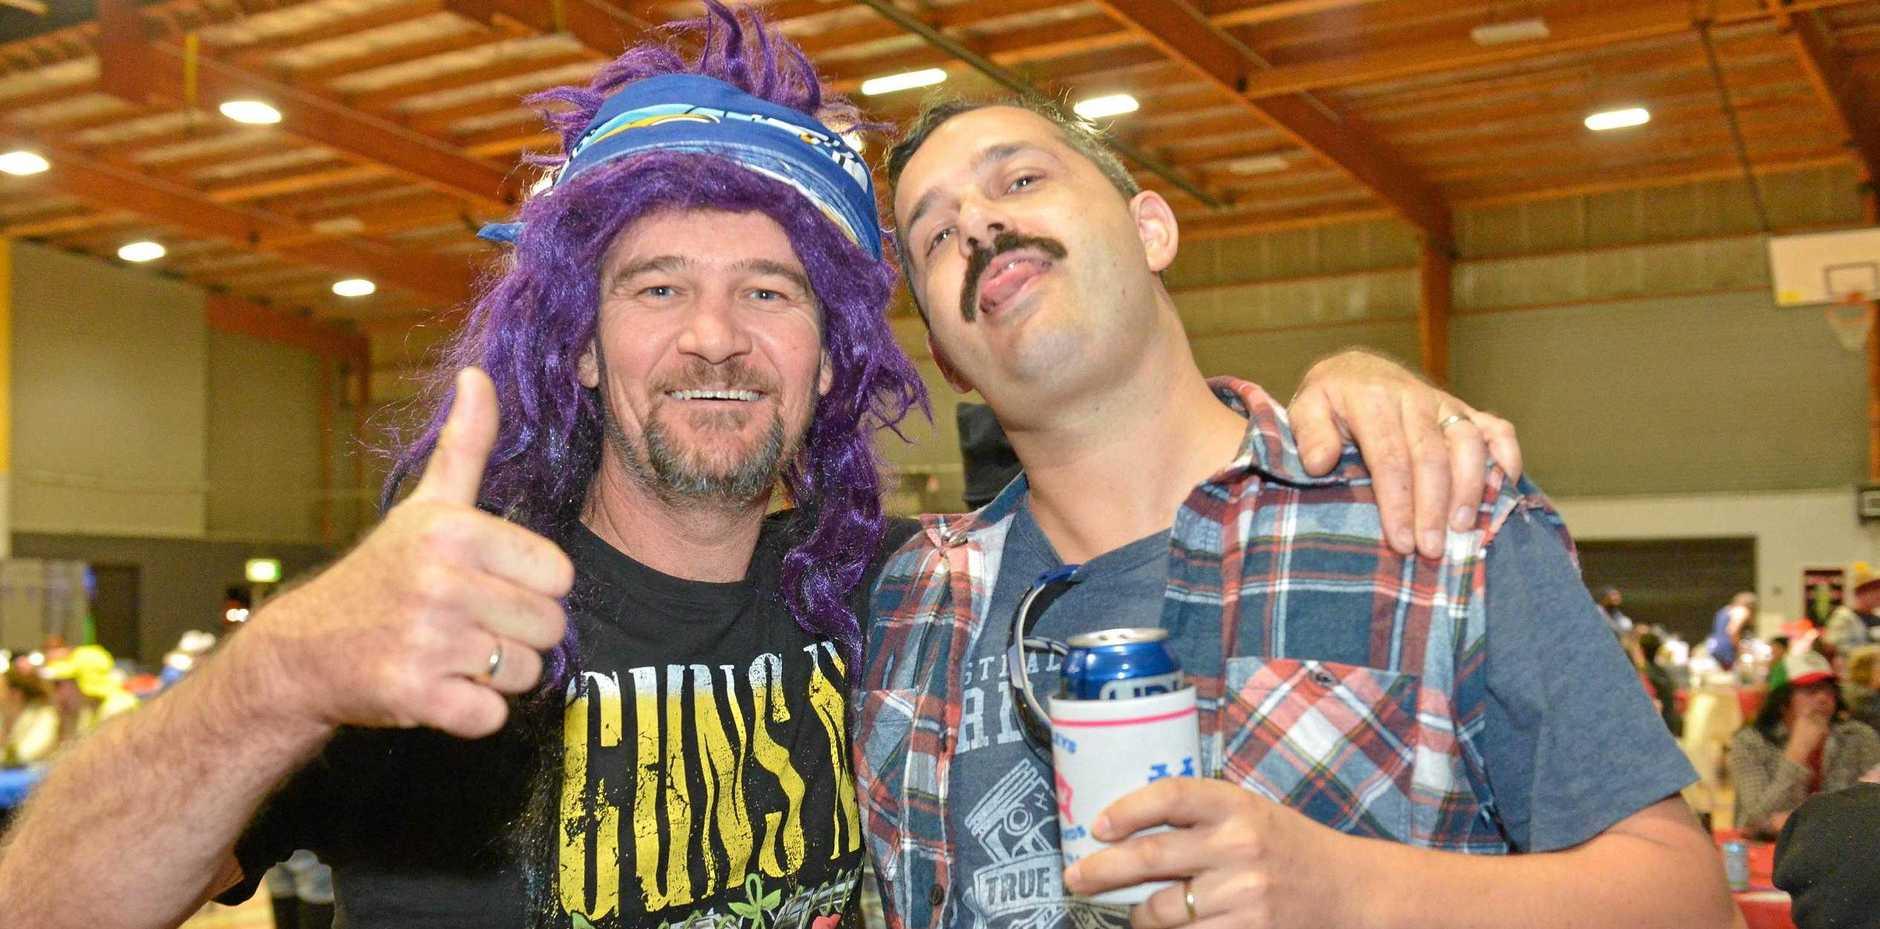 Bret and Craig at last year's Bogan Bingo fundraiser.